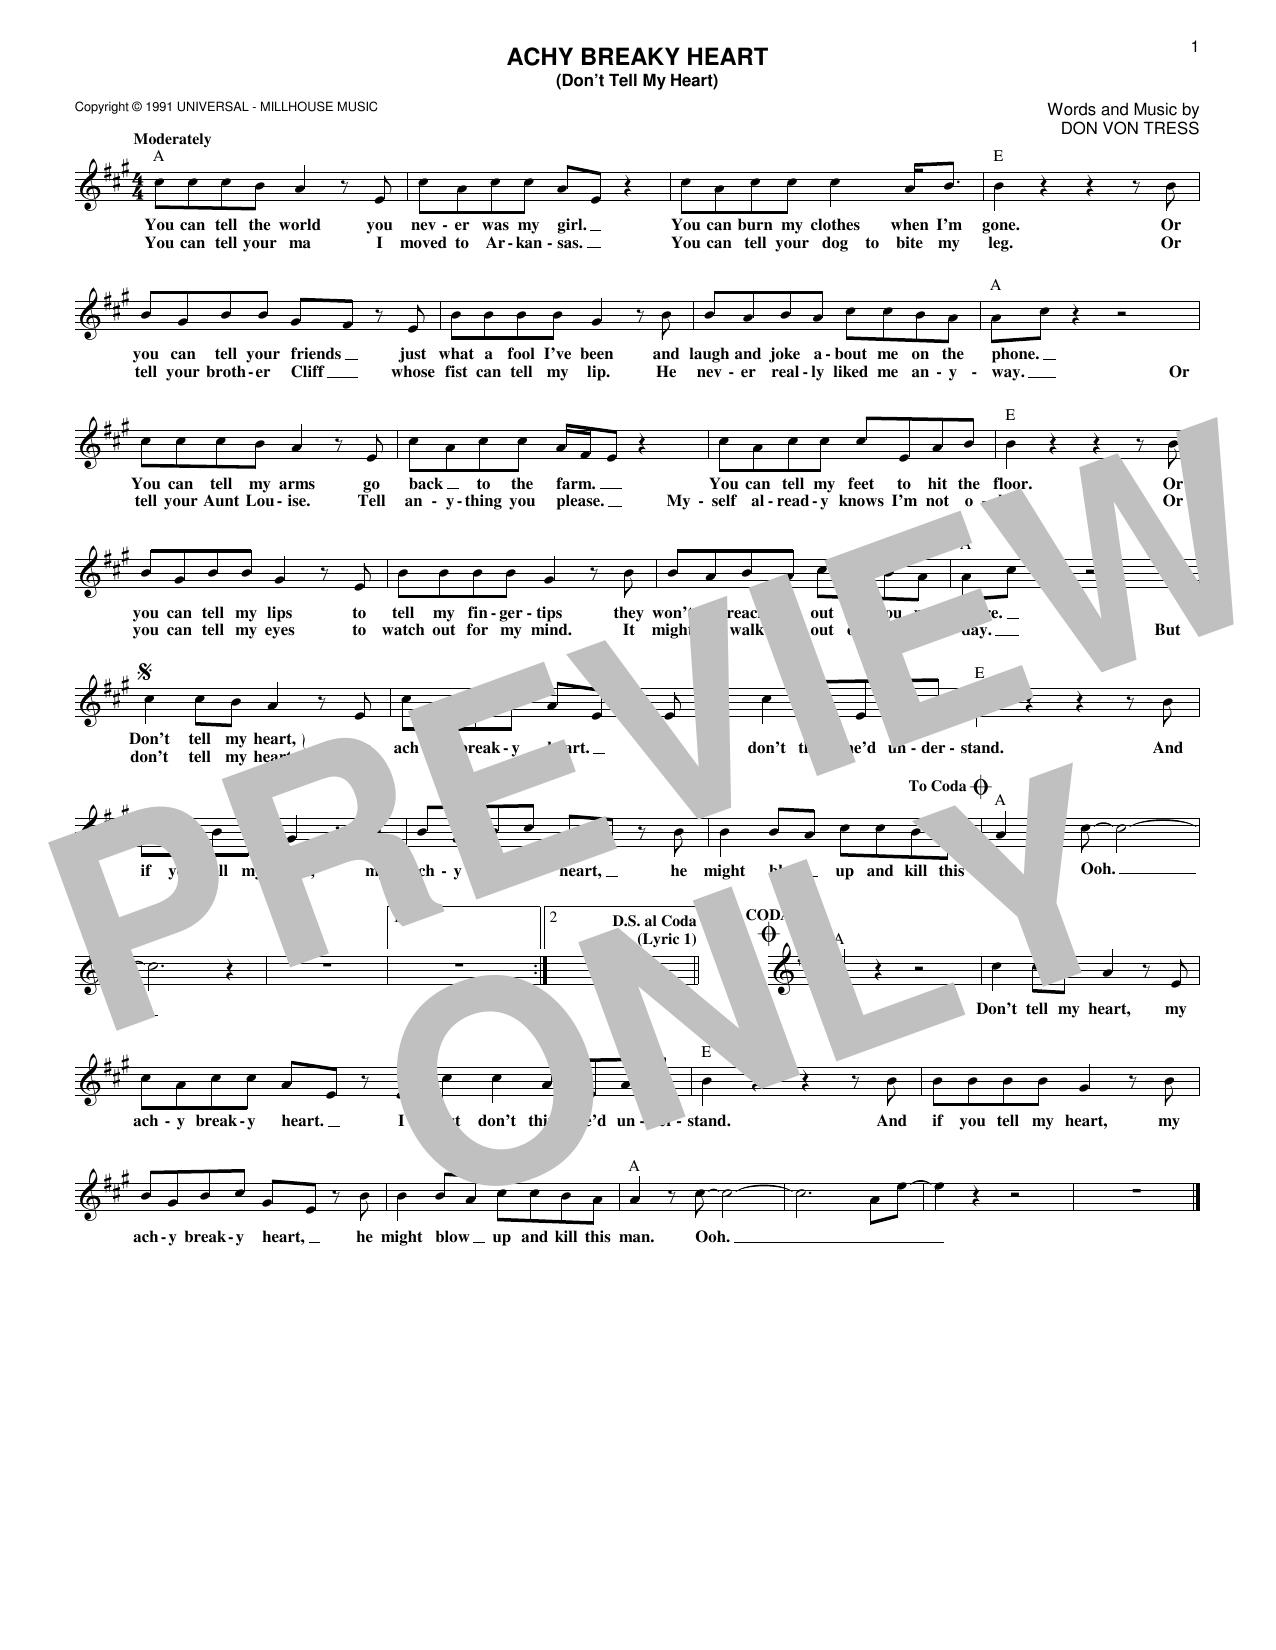 Billy Ray Cyrus - Achy Breaky Heart (Don't Tell My Heart)